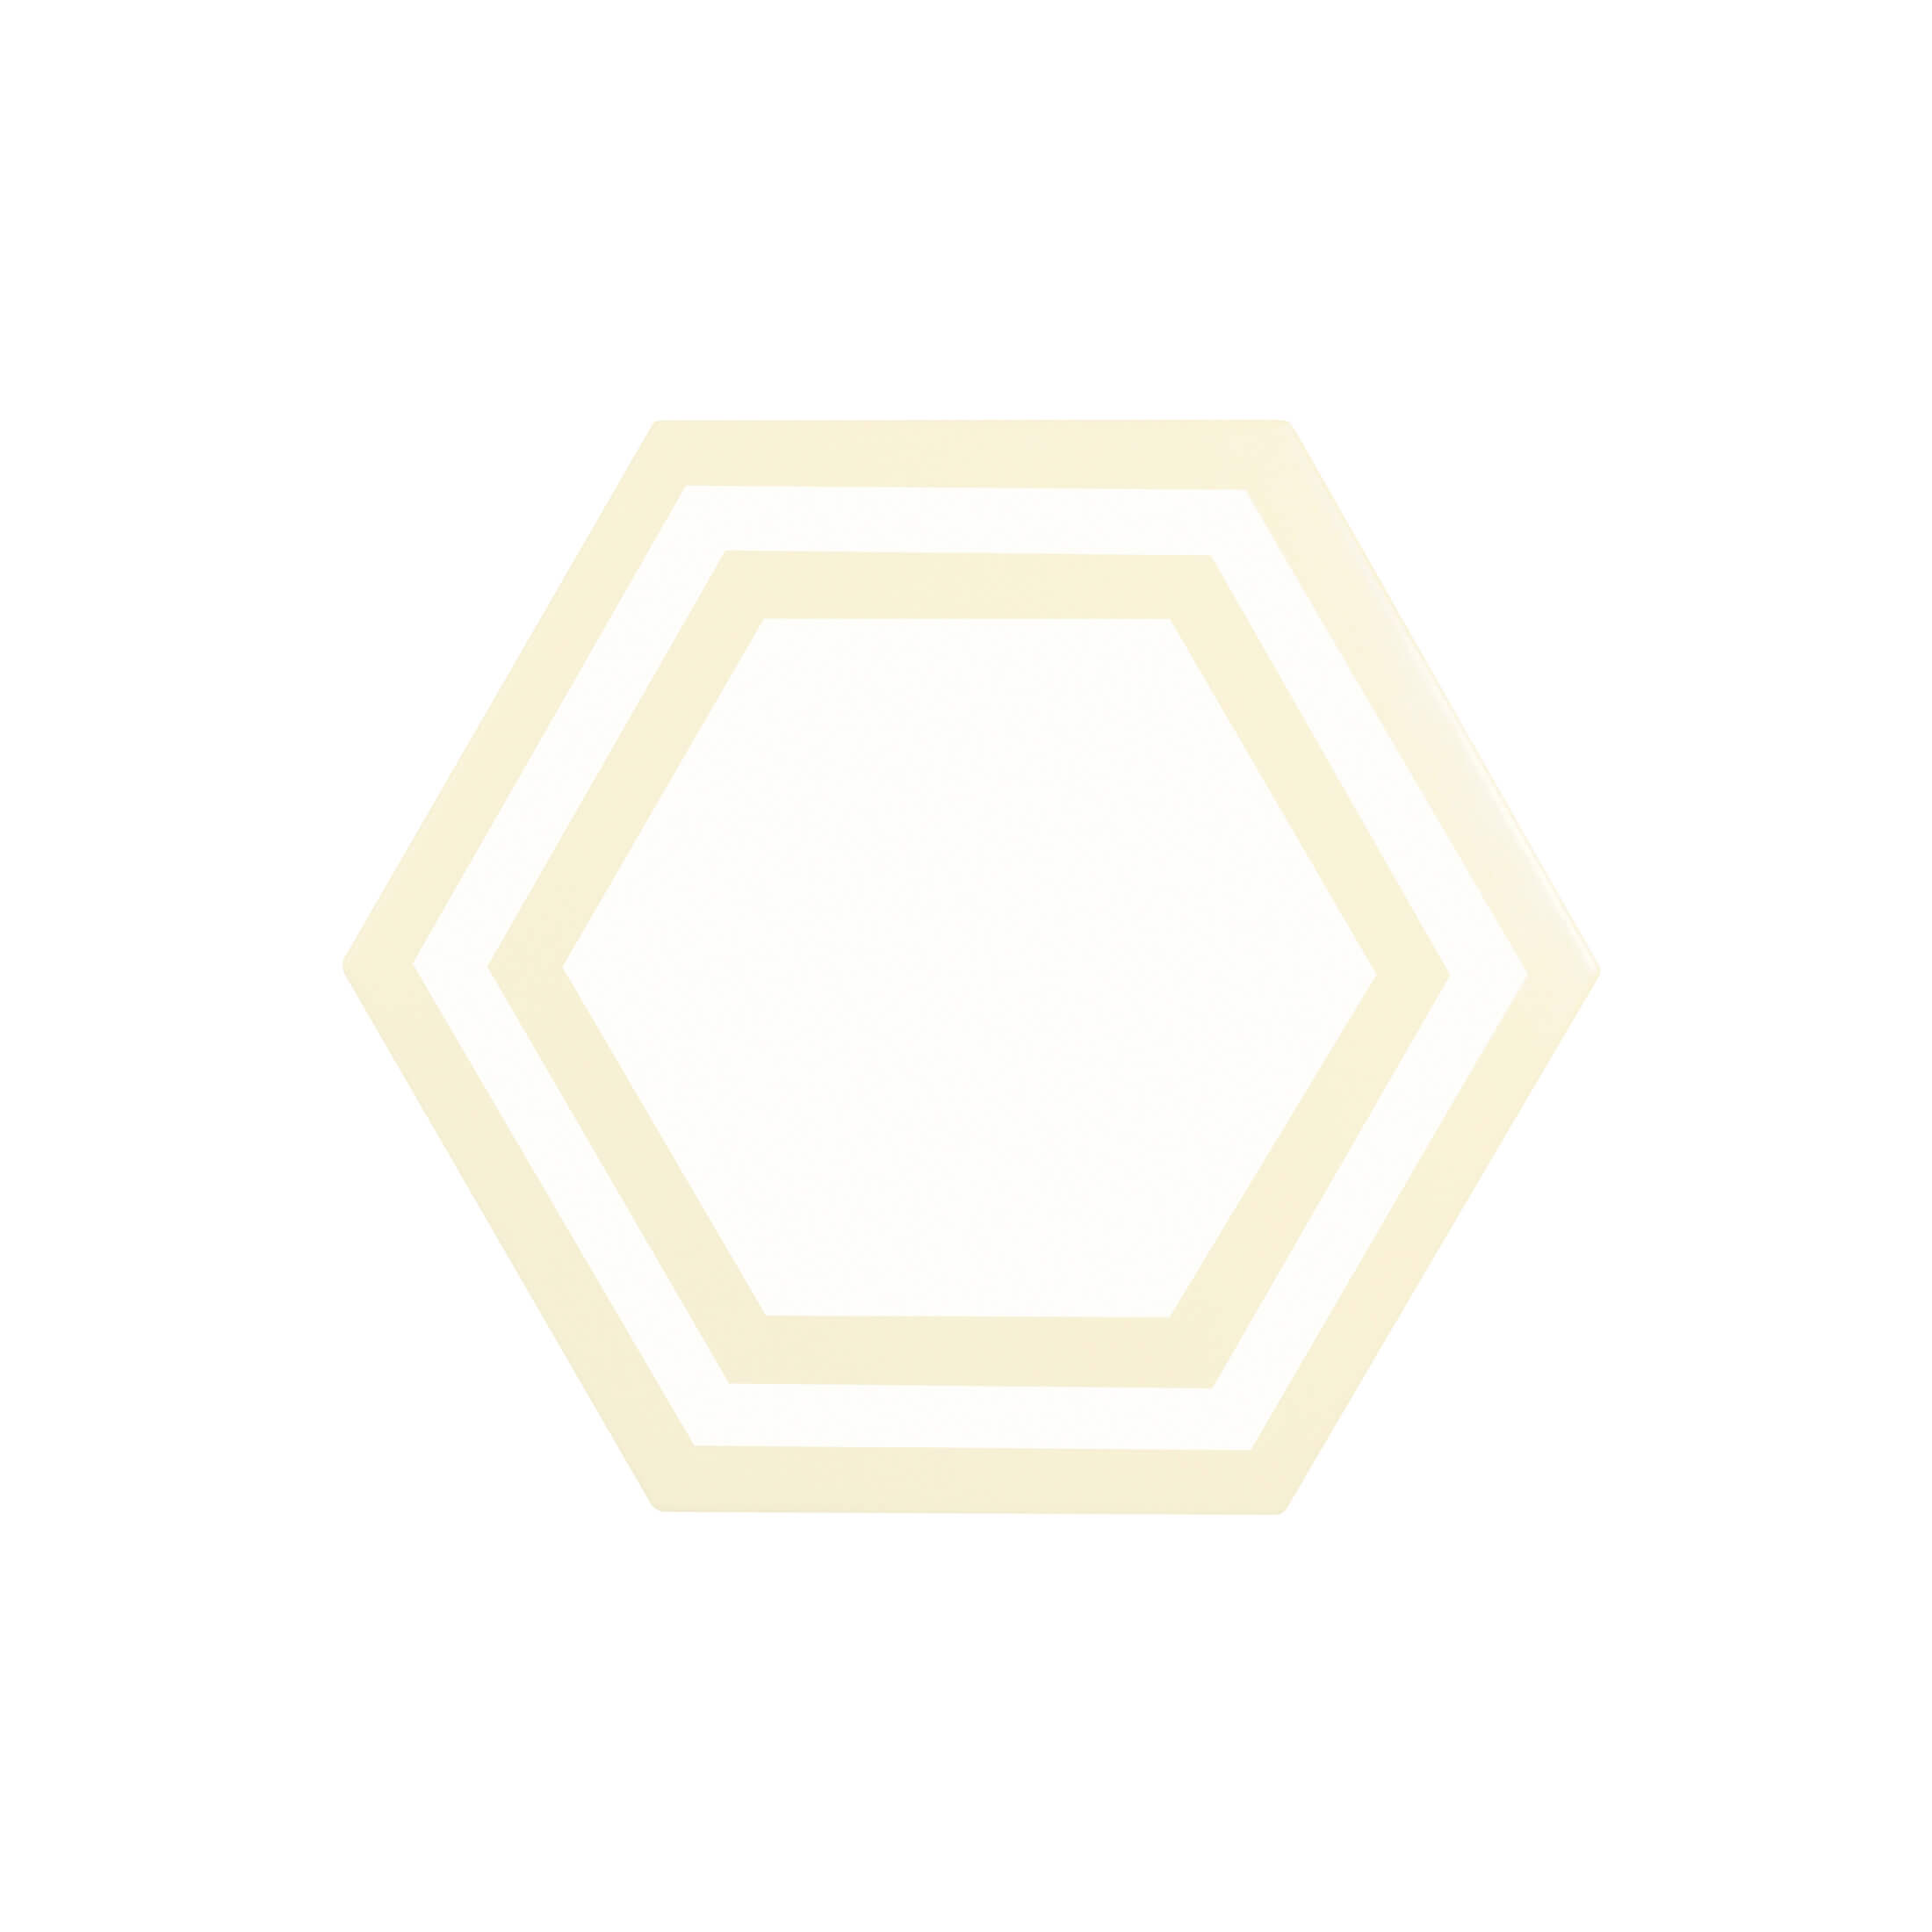 ADPV9017 - PAVIMENTO DECO BONE - 20 cm X 2,3 cm